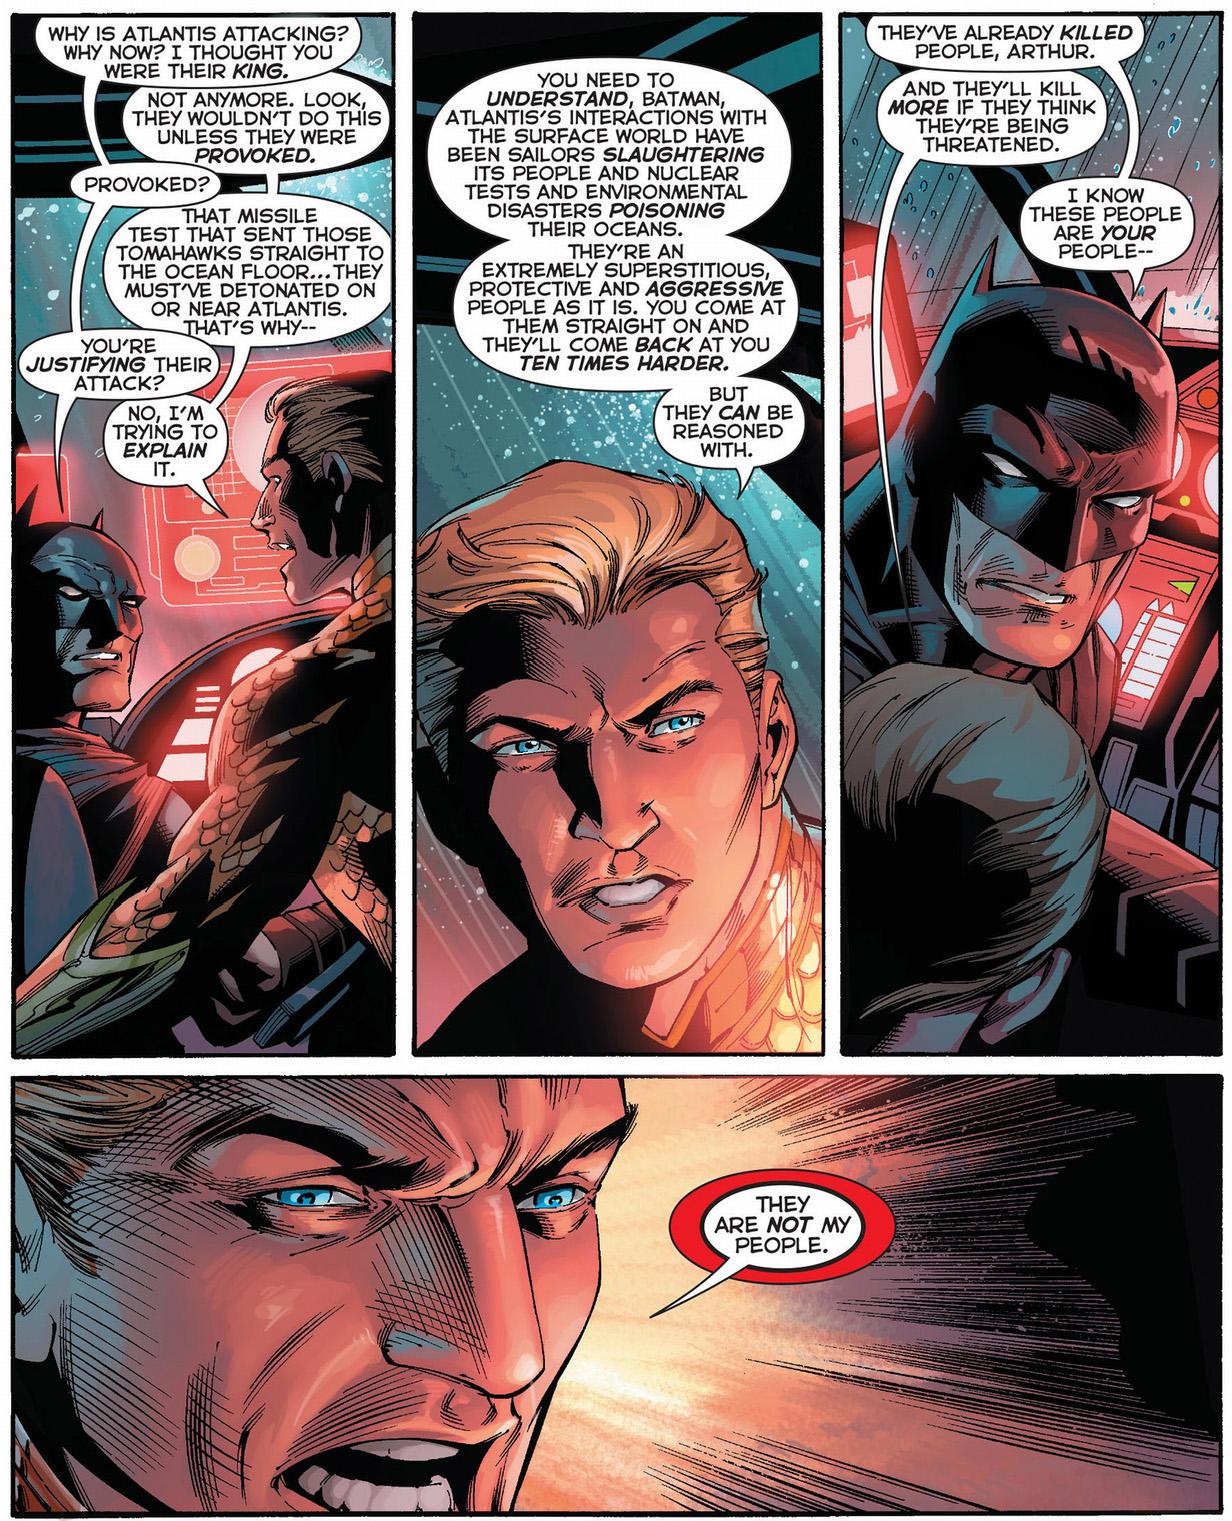 aquaman explains how atlanteans think to batman